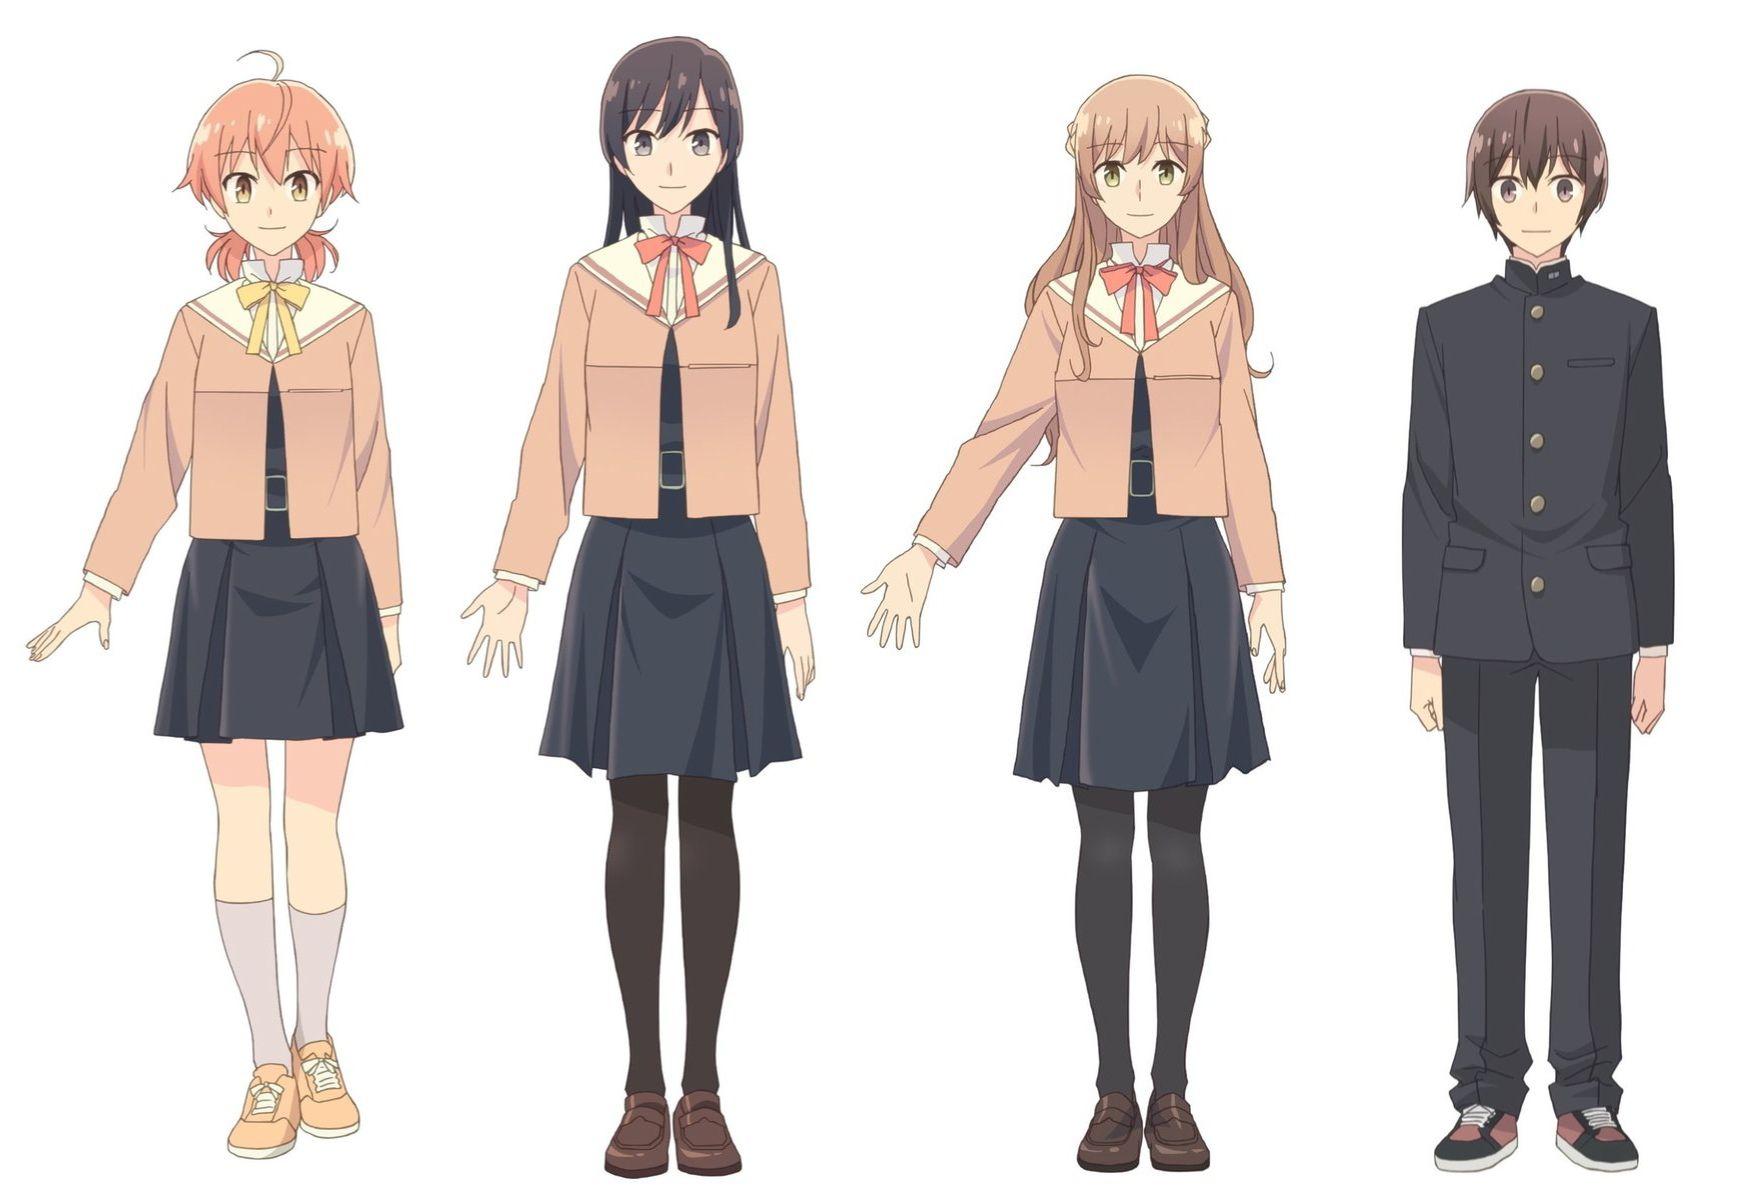 "Char-disi main characters to the series ""Yagate Kimi ni Naru"". The premiere in October. | Yuri anime, Anime films, Kawaii anime"